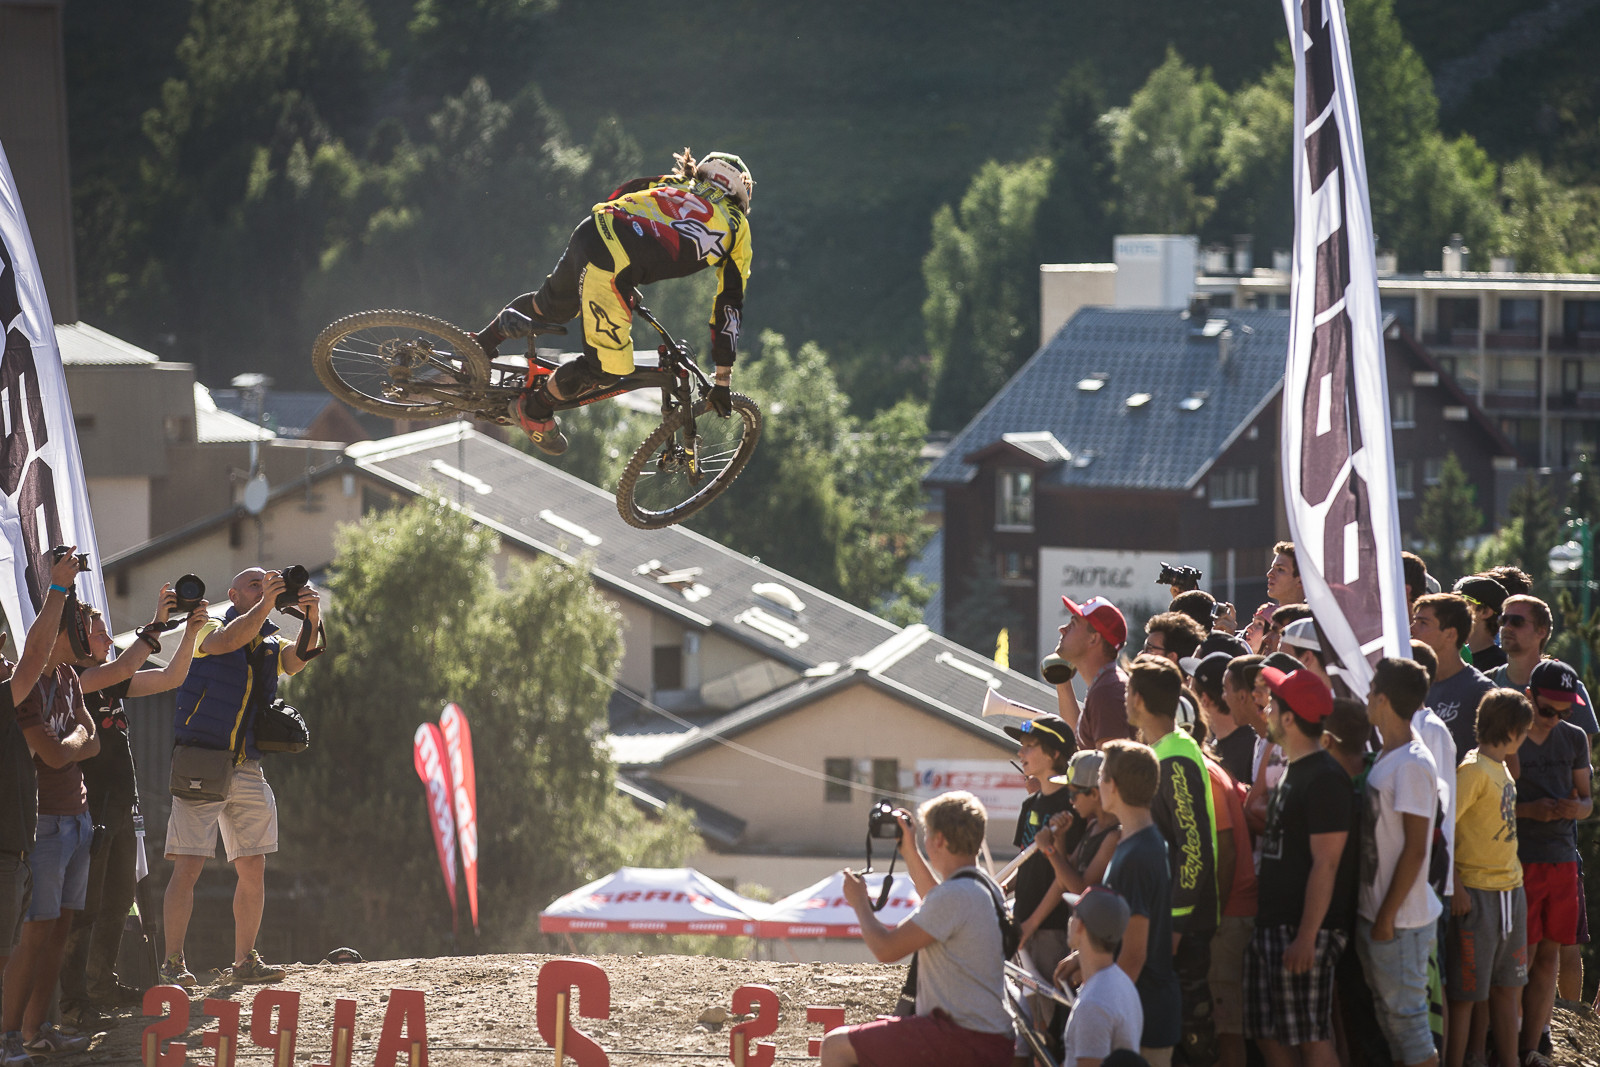 Remy Morton, Whip Off European Champs, Crankworx L2A - Whip Off European Champs, Crankworx L2A - Mountain Biking Pictures - Vital MTB